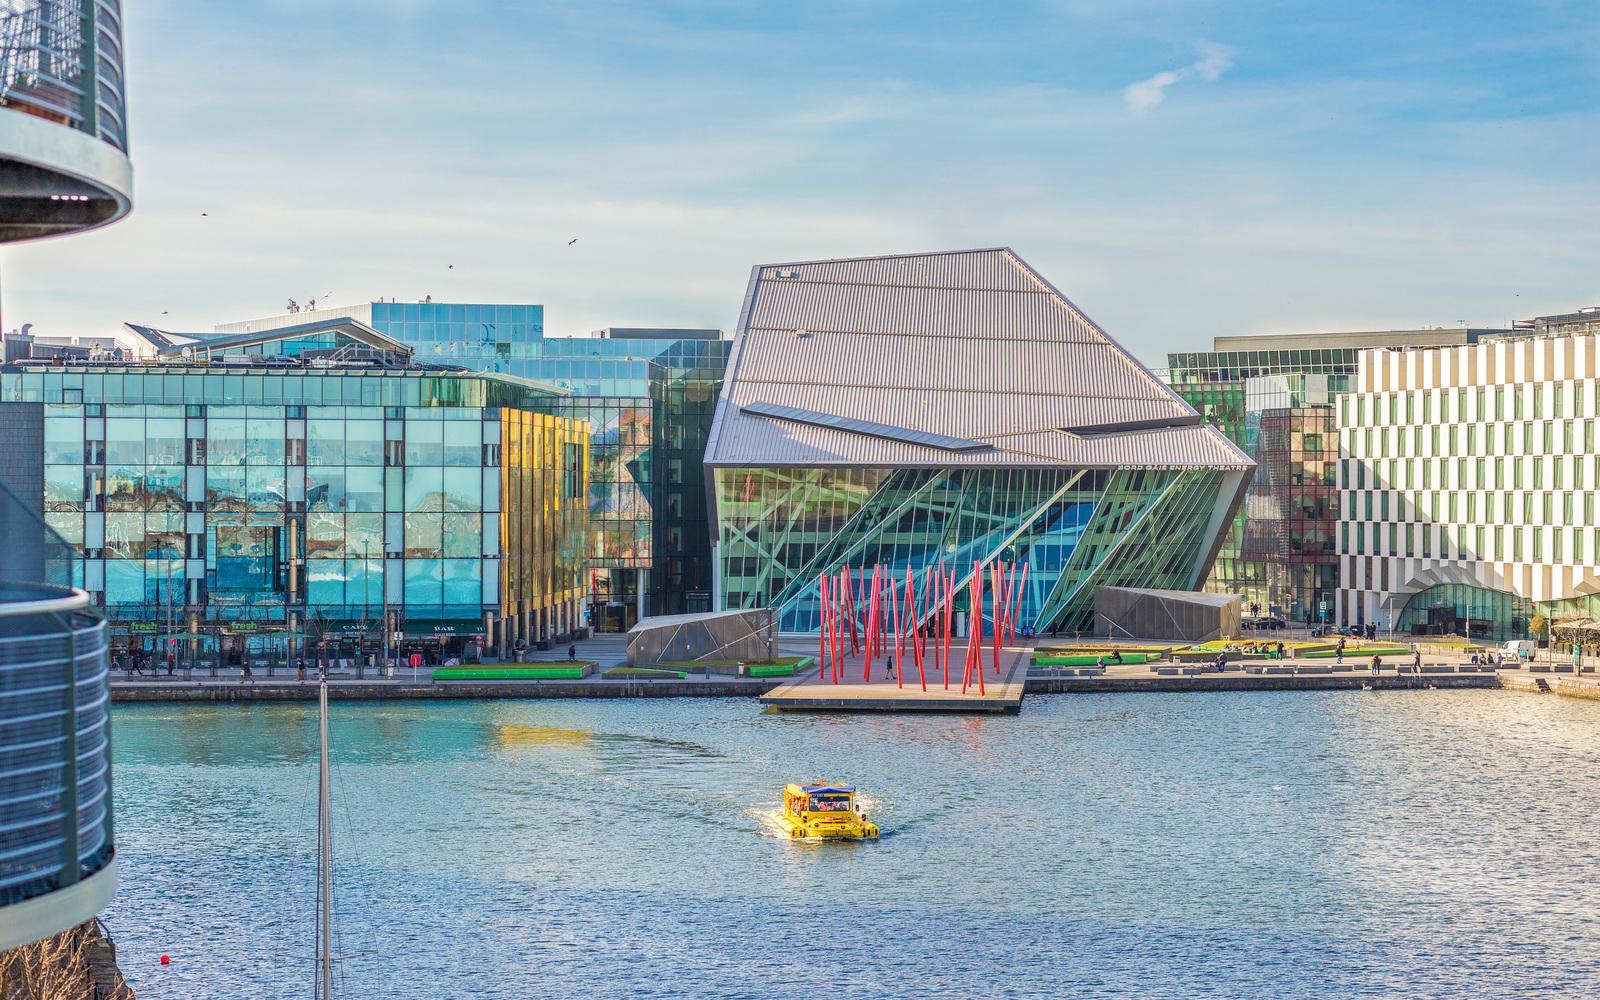 64 The Waterside, Grand Canal Dock, Dublin 4 - Owen Reilly